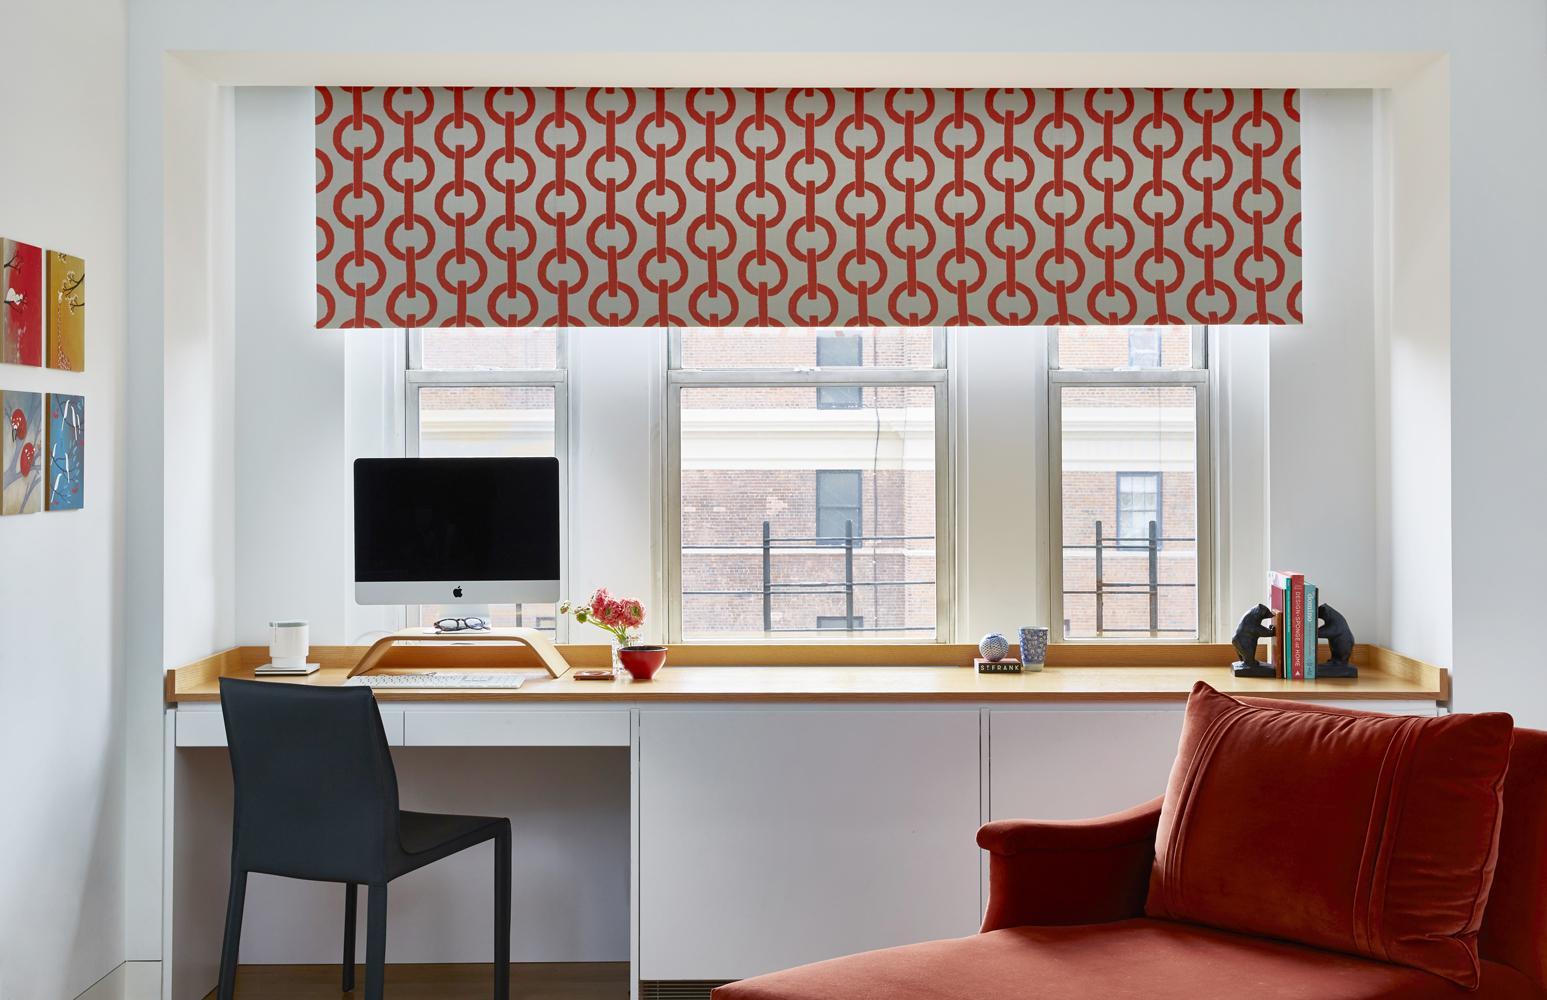 Custom-Windows-Orange-Red-Home-Office-Mac-Desktop-JMorrisDesign-Brooklyn-Interior-Designer.jpg